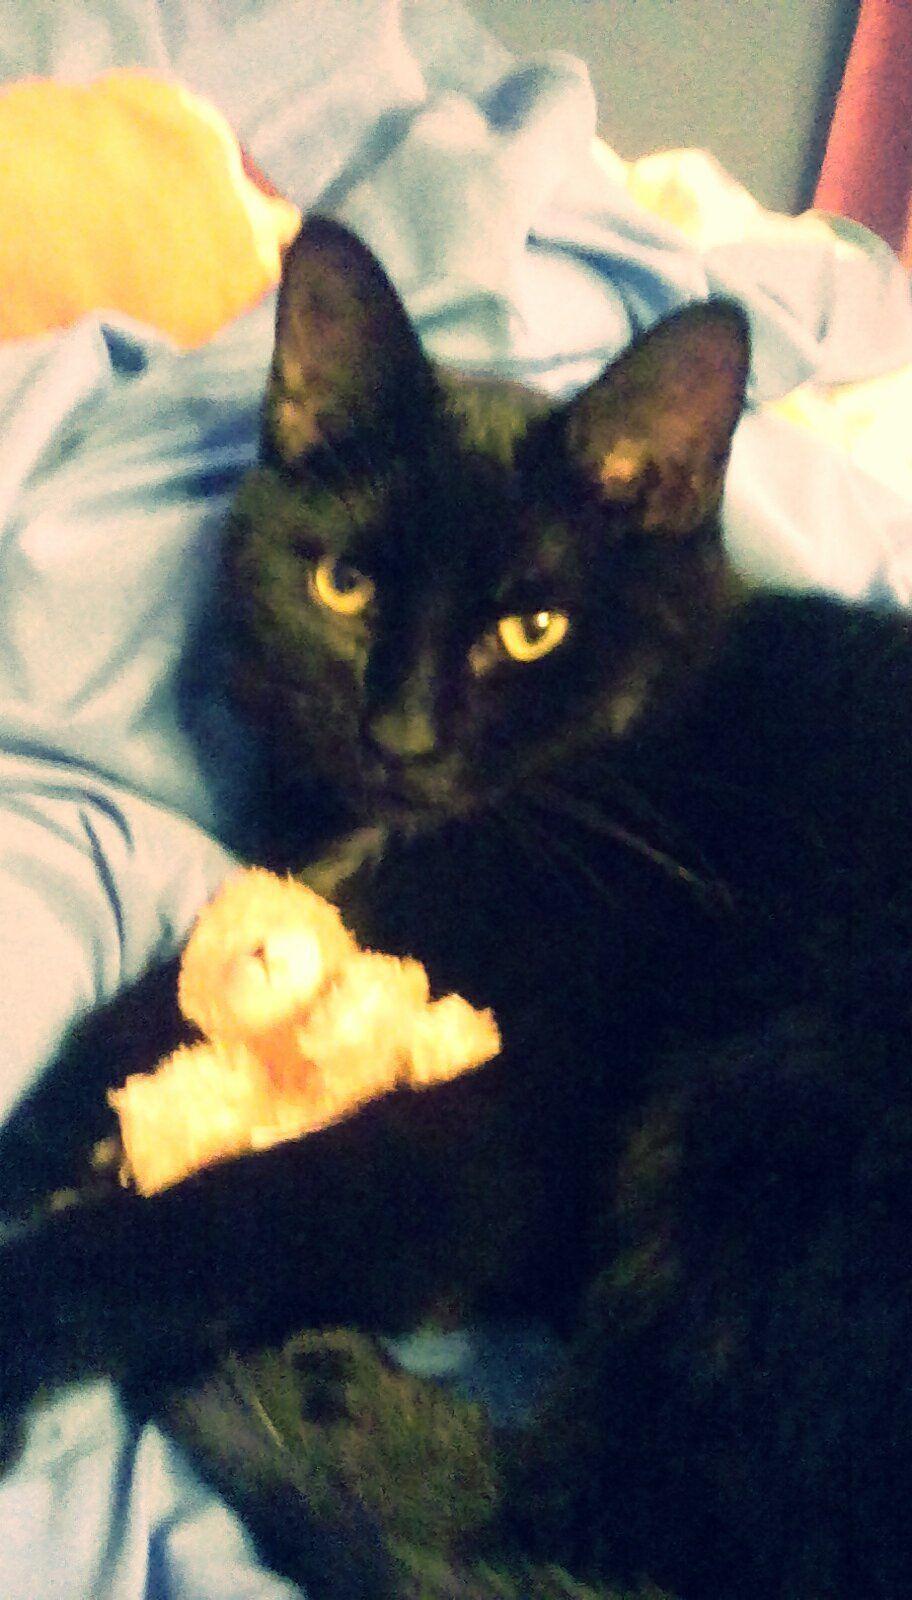 My cat! He's so adorable!!!<3